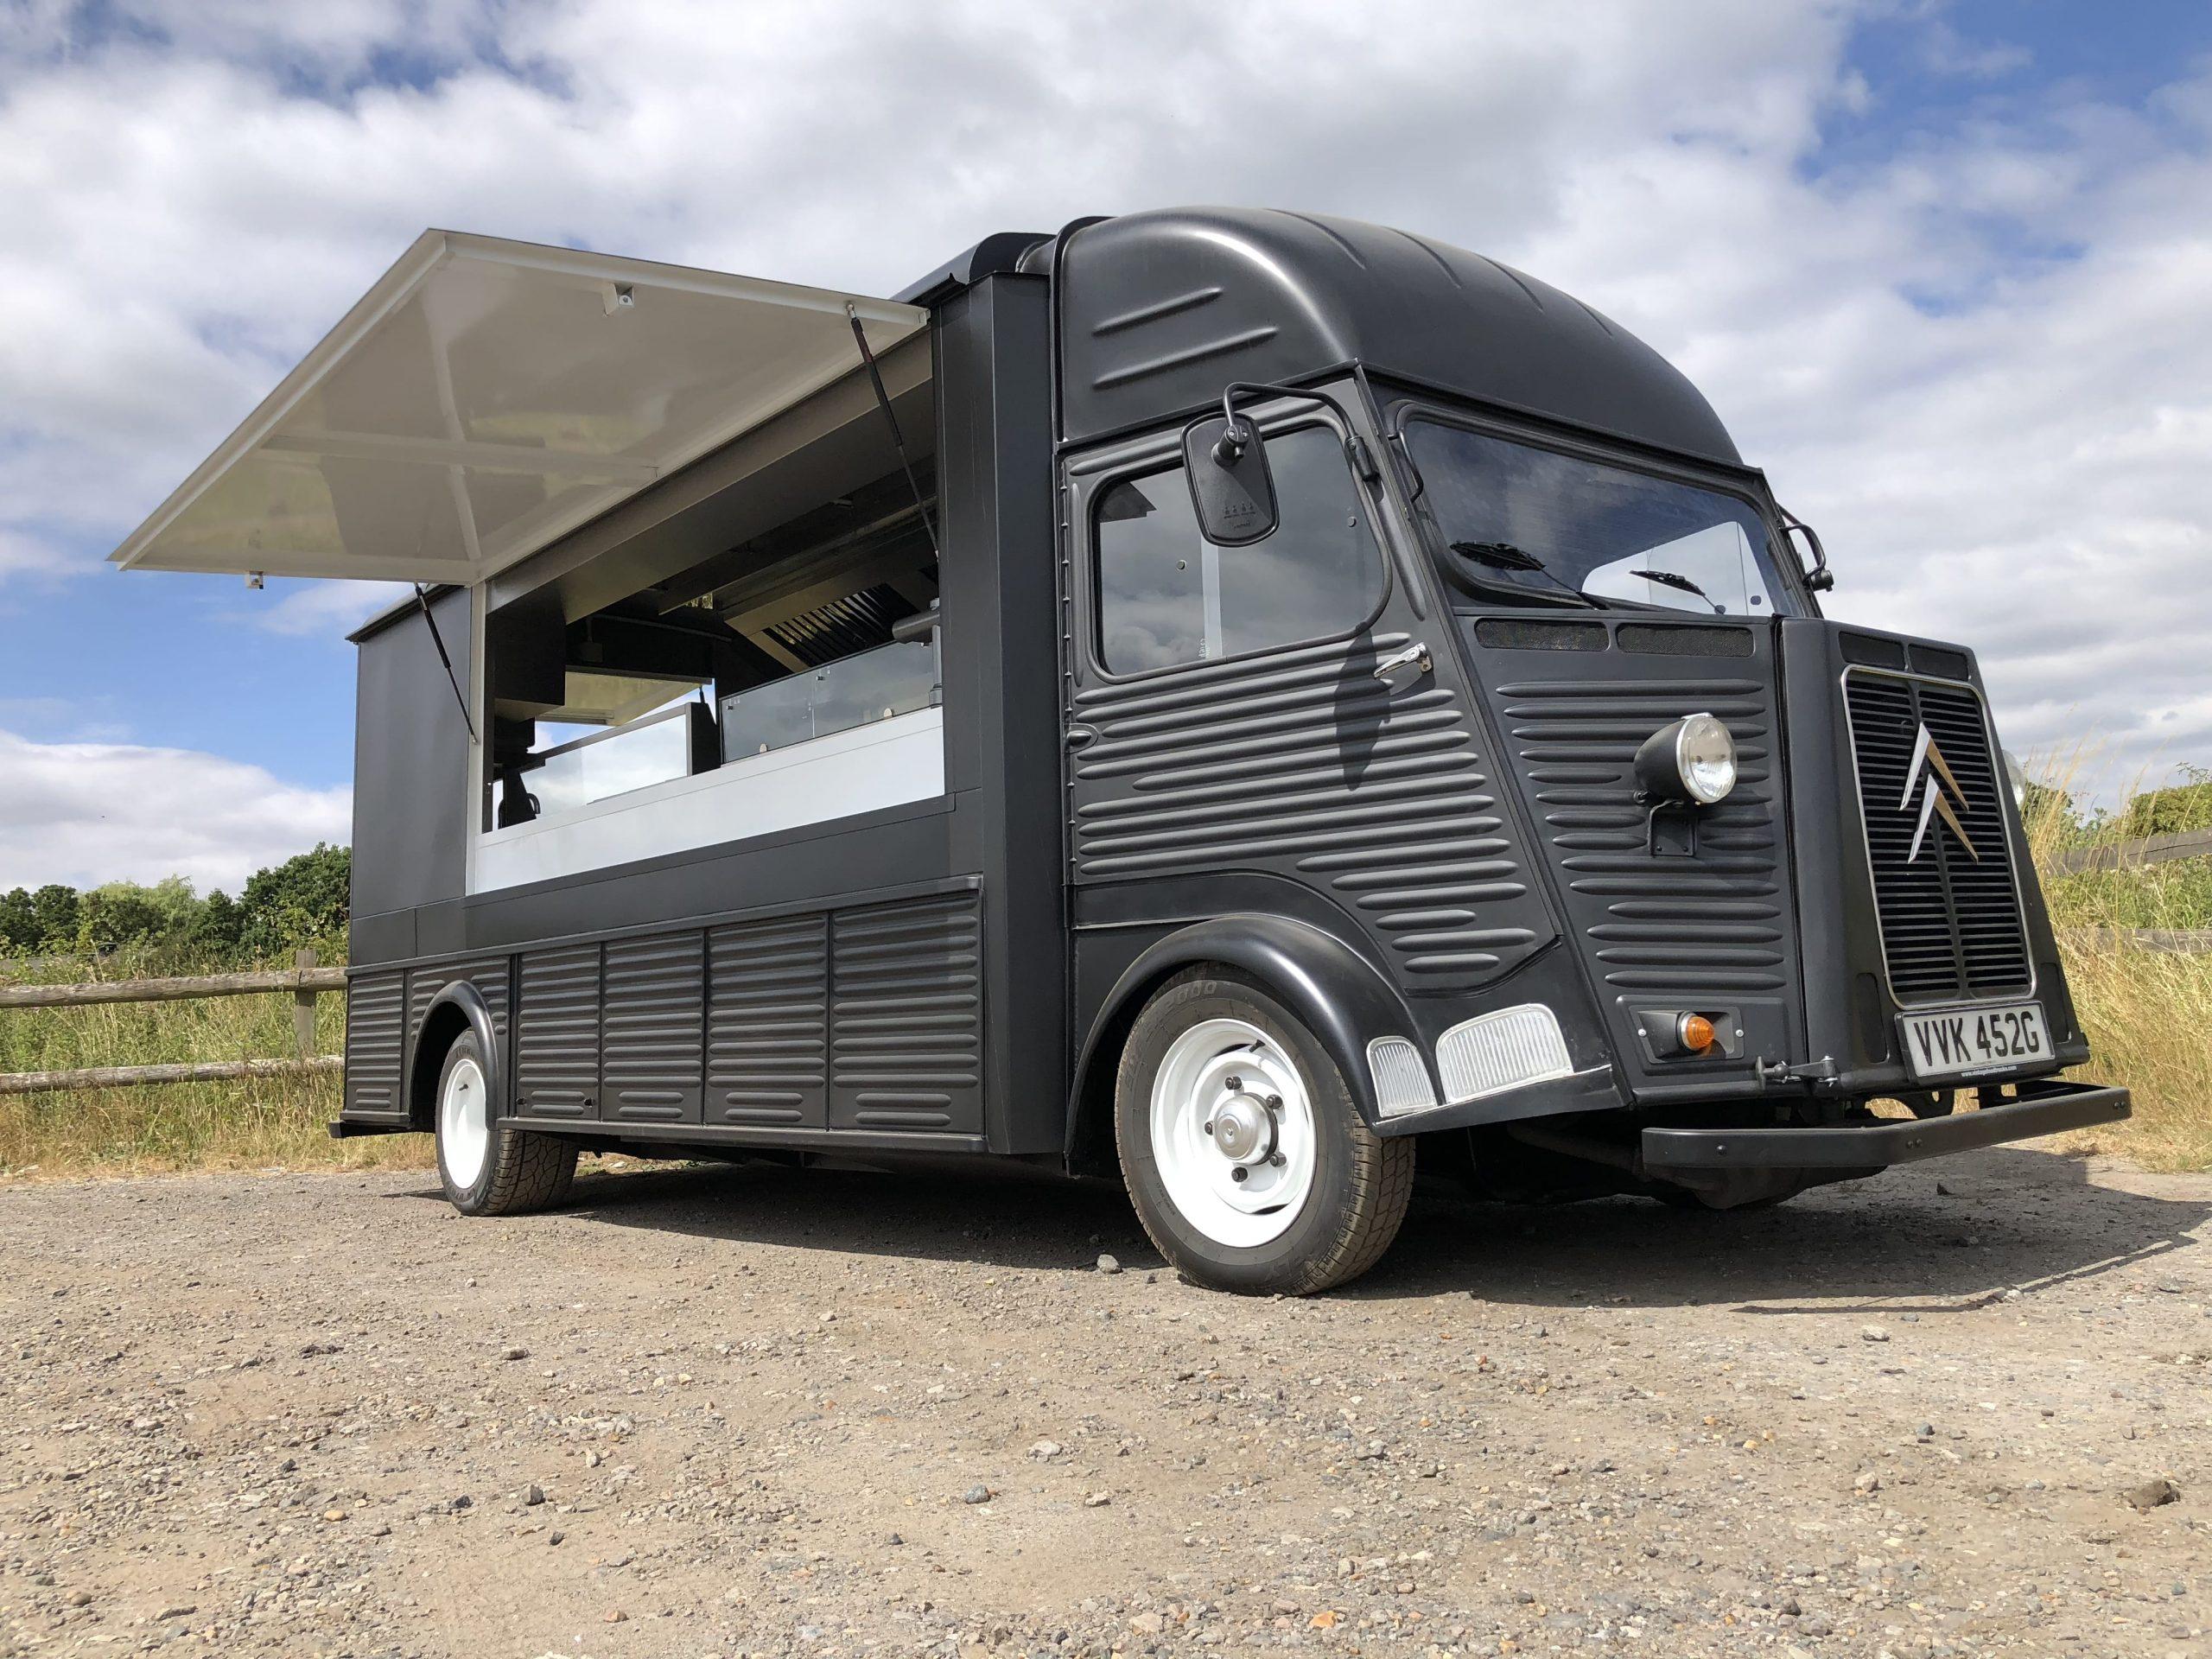 vintage food-truck